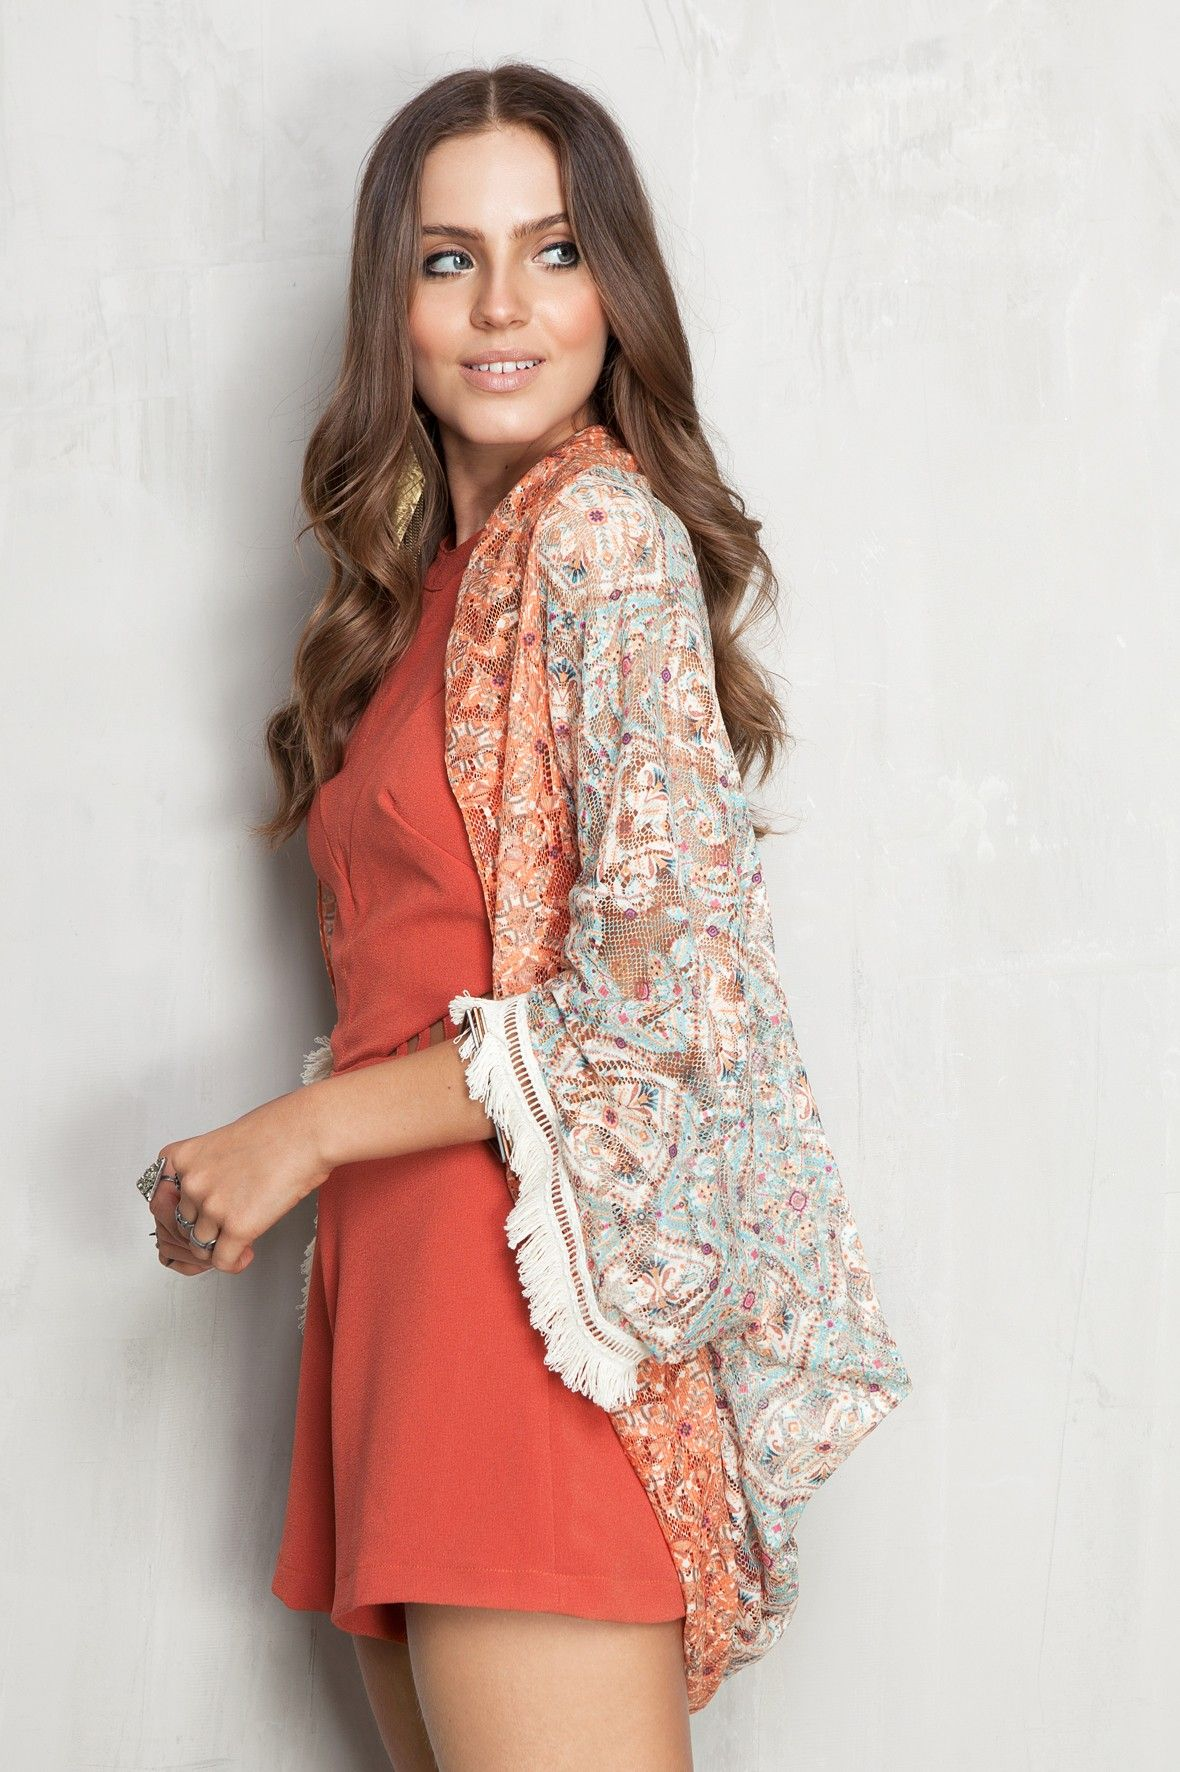 Lace dress bell sleeves june 2019 capão estampado lace  Dress to  cloth  Pinterest  Lace dress